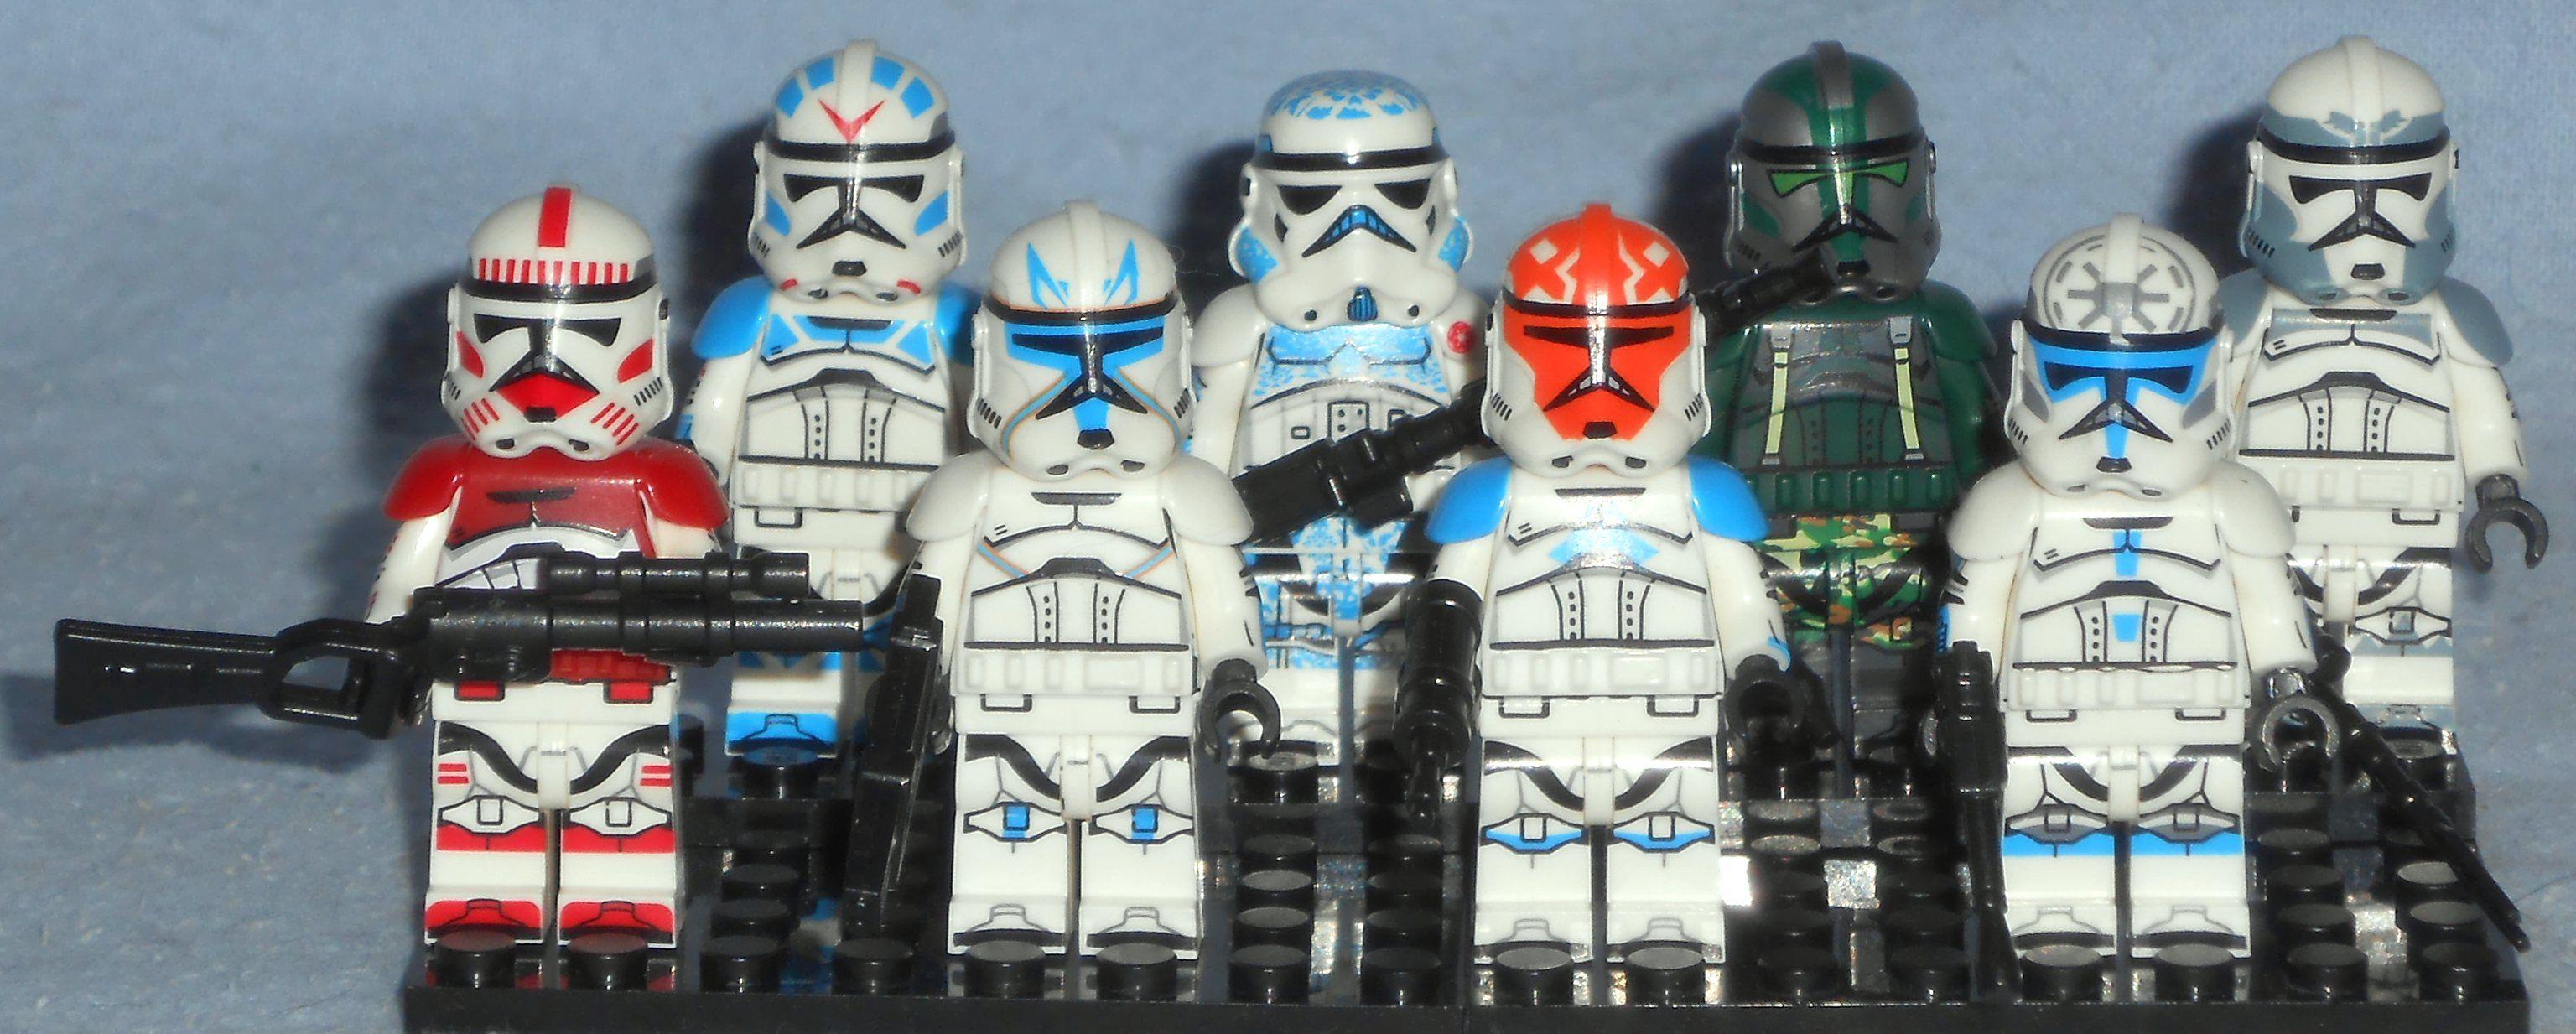 Disney Store Star Wars The Mandalorian Scout Trooper Figure Christmas Tree Decoration Ornament